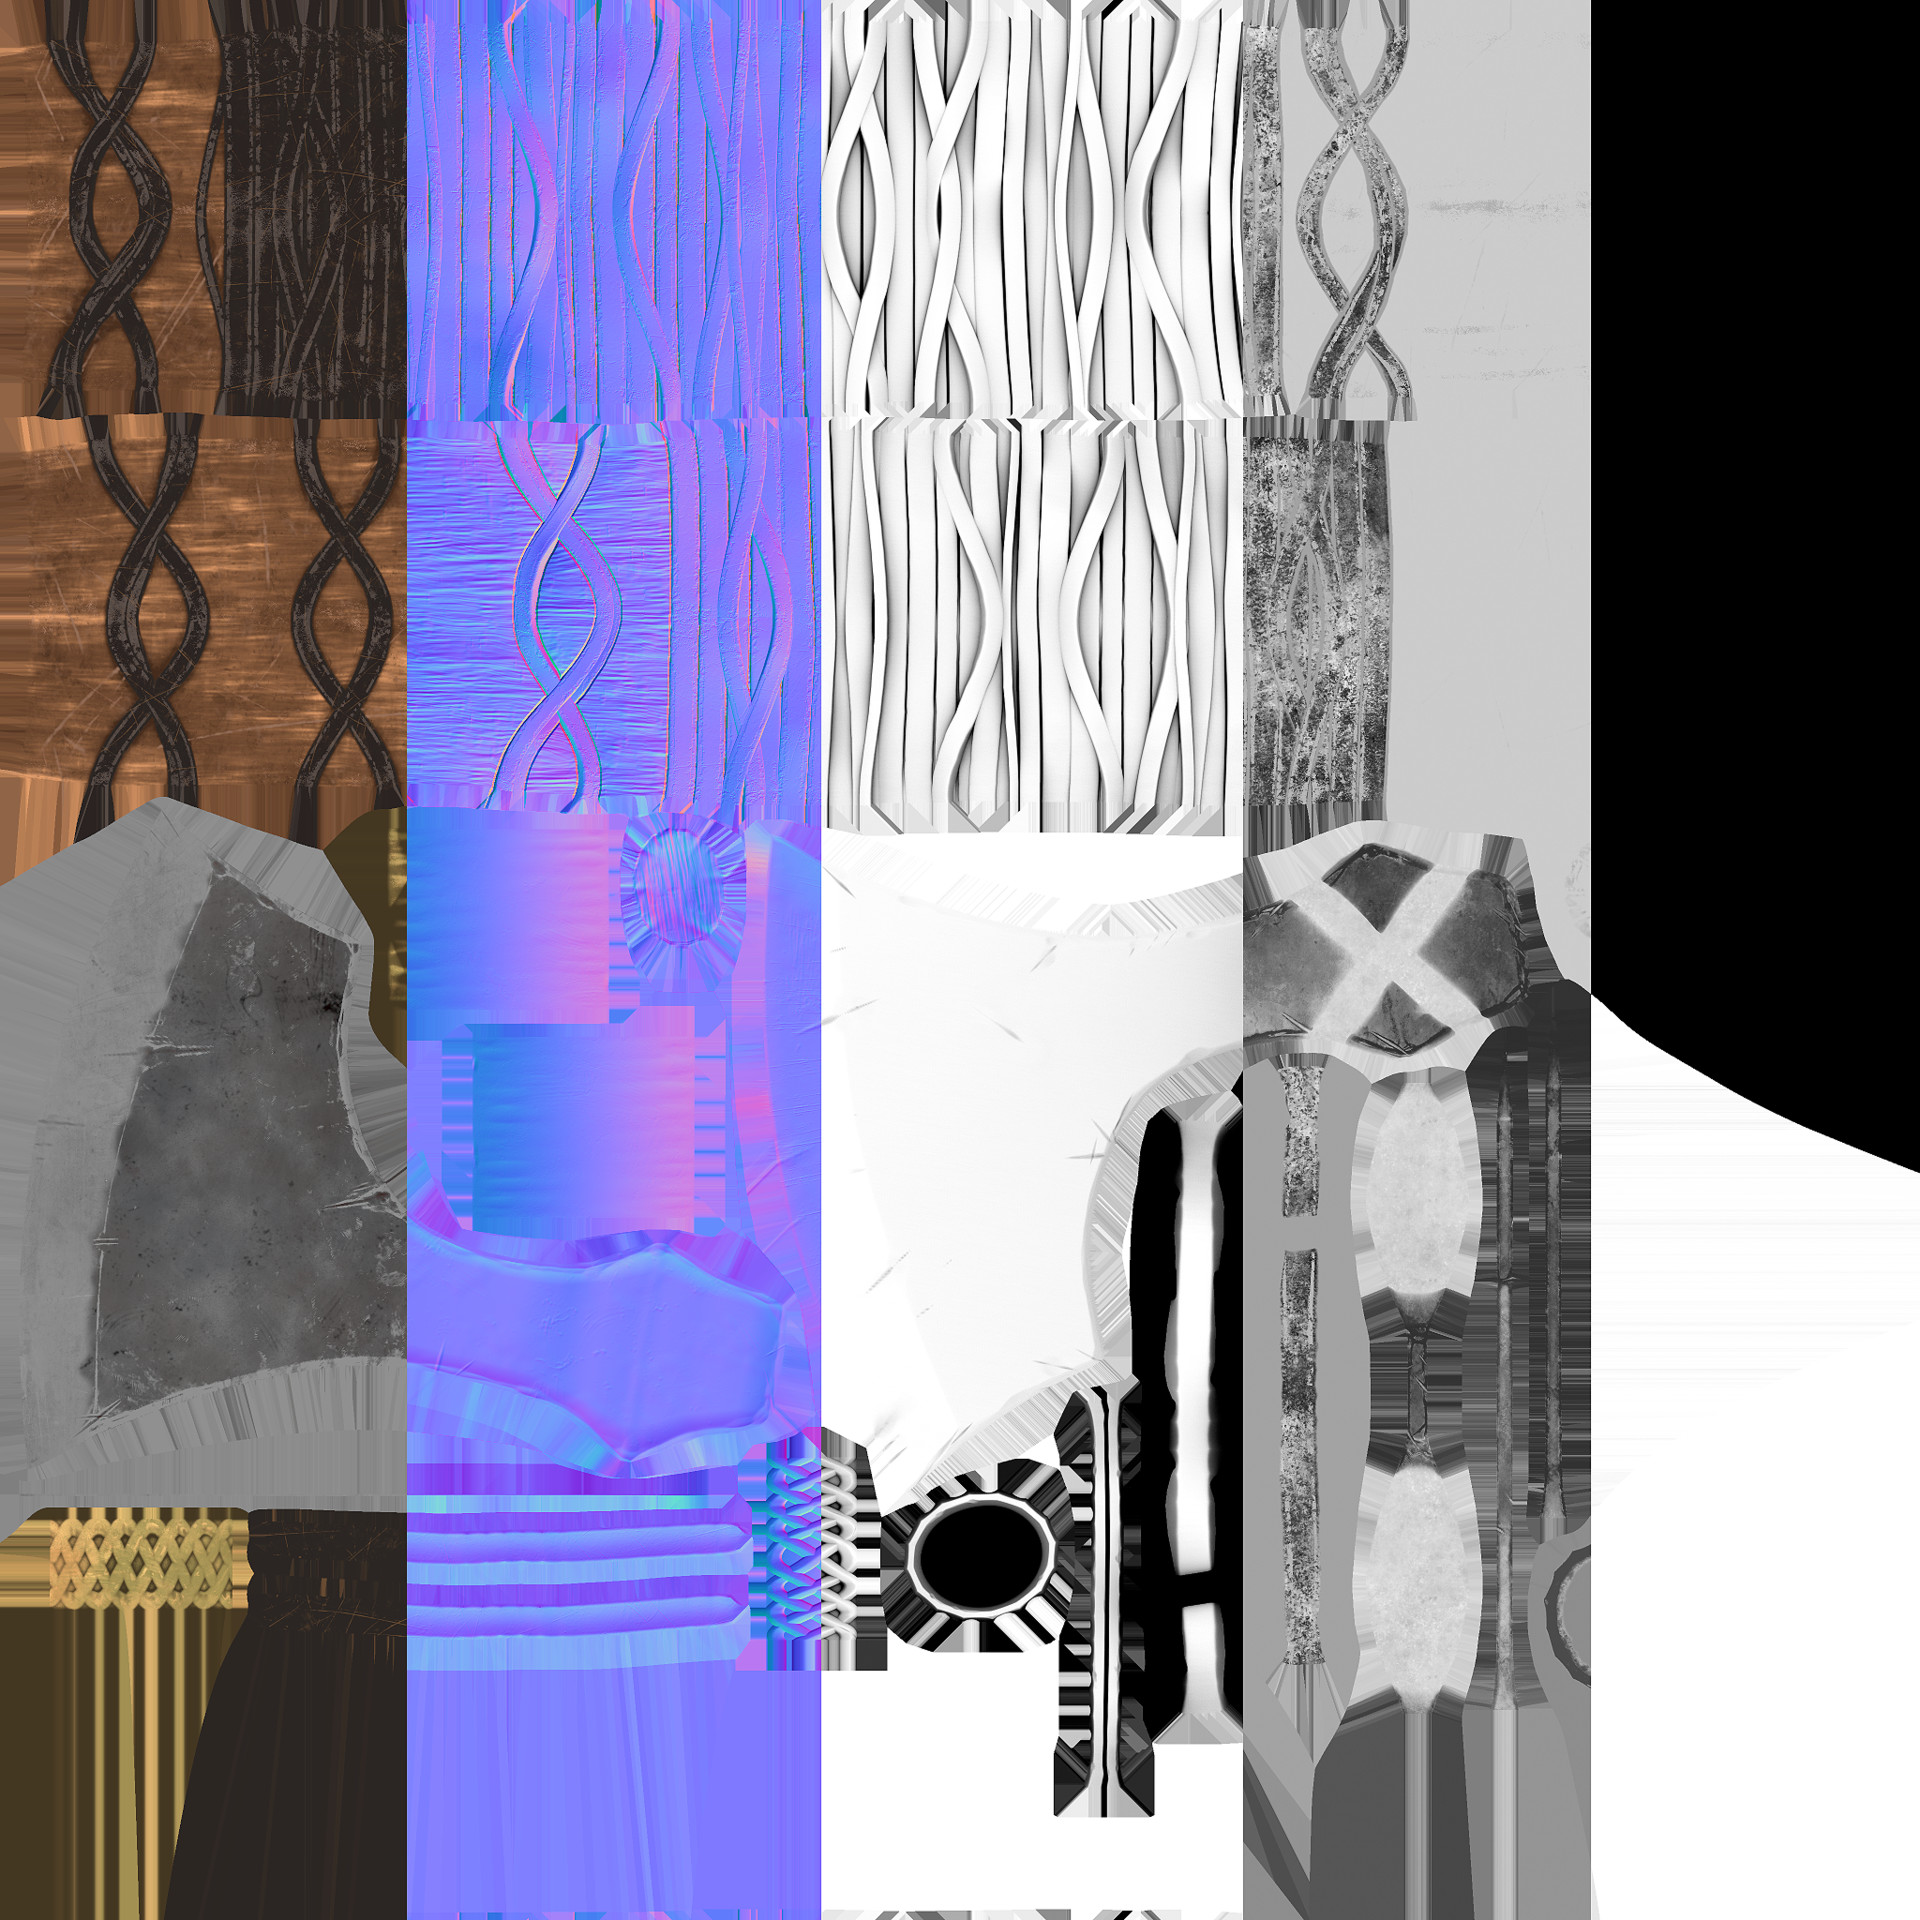 Roger perez textures01